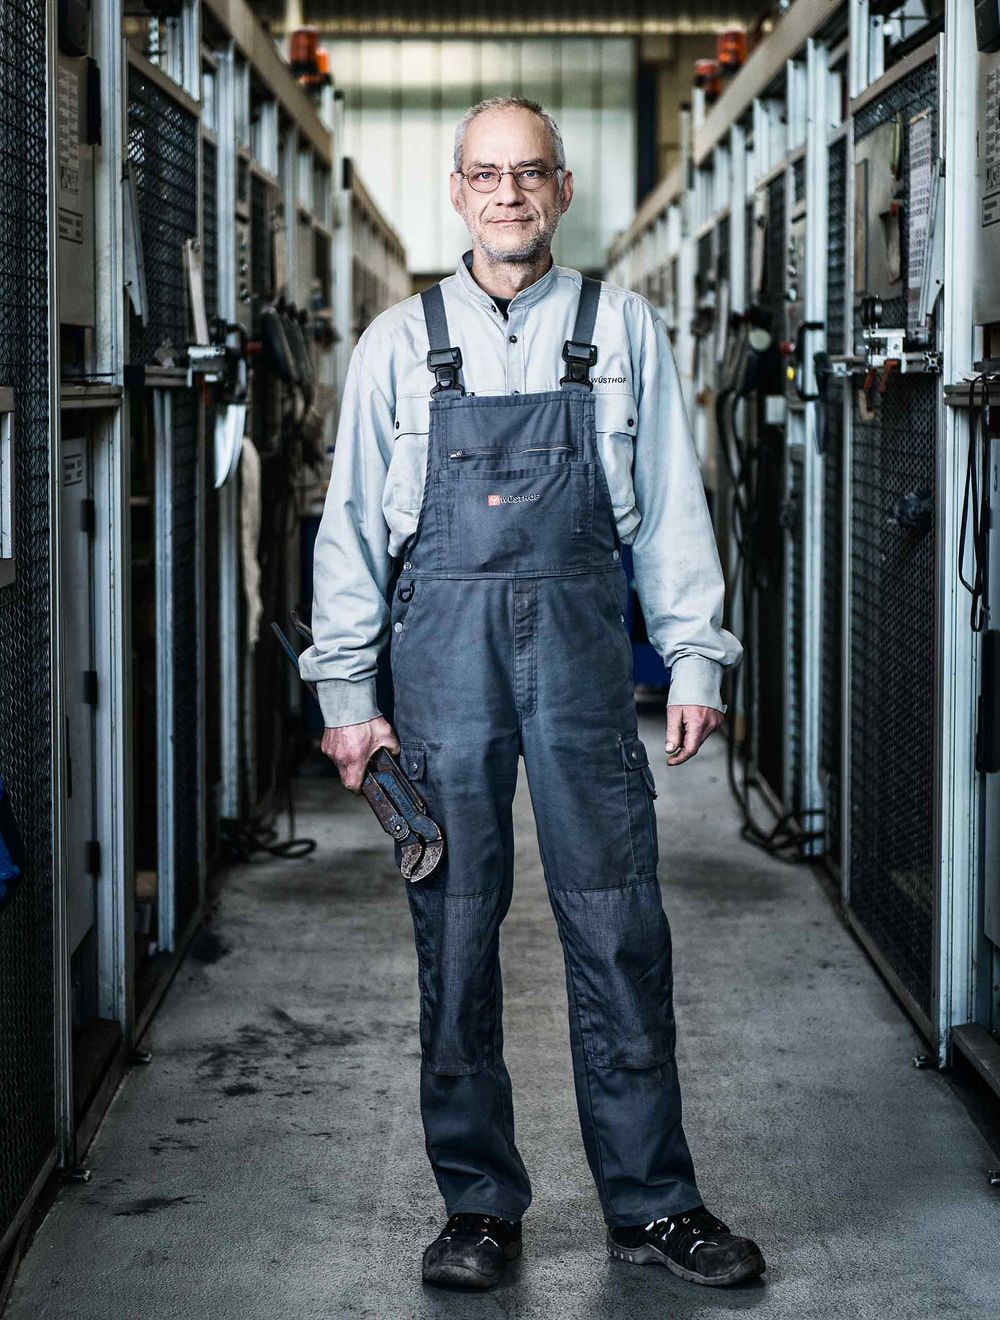 dependability-wustof-factory-solingen-germany-by-HenrikOlundPhotography.jpg